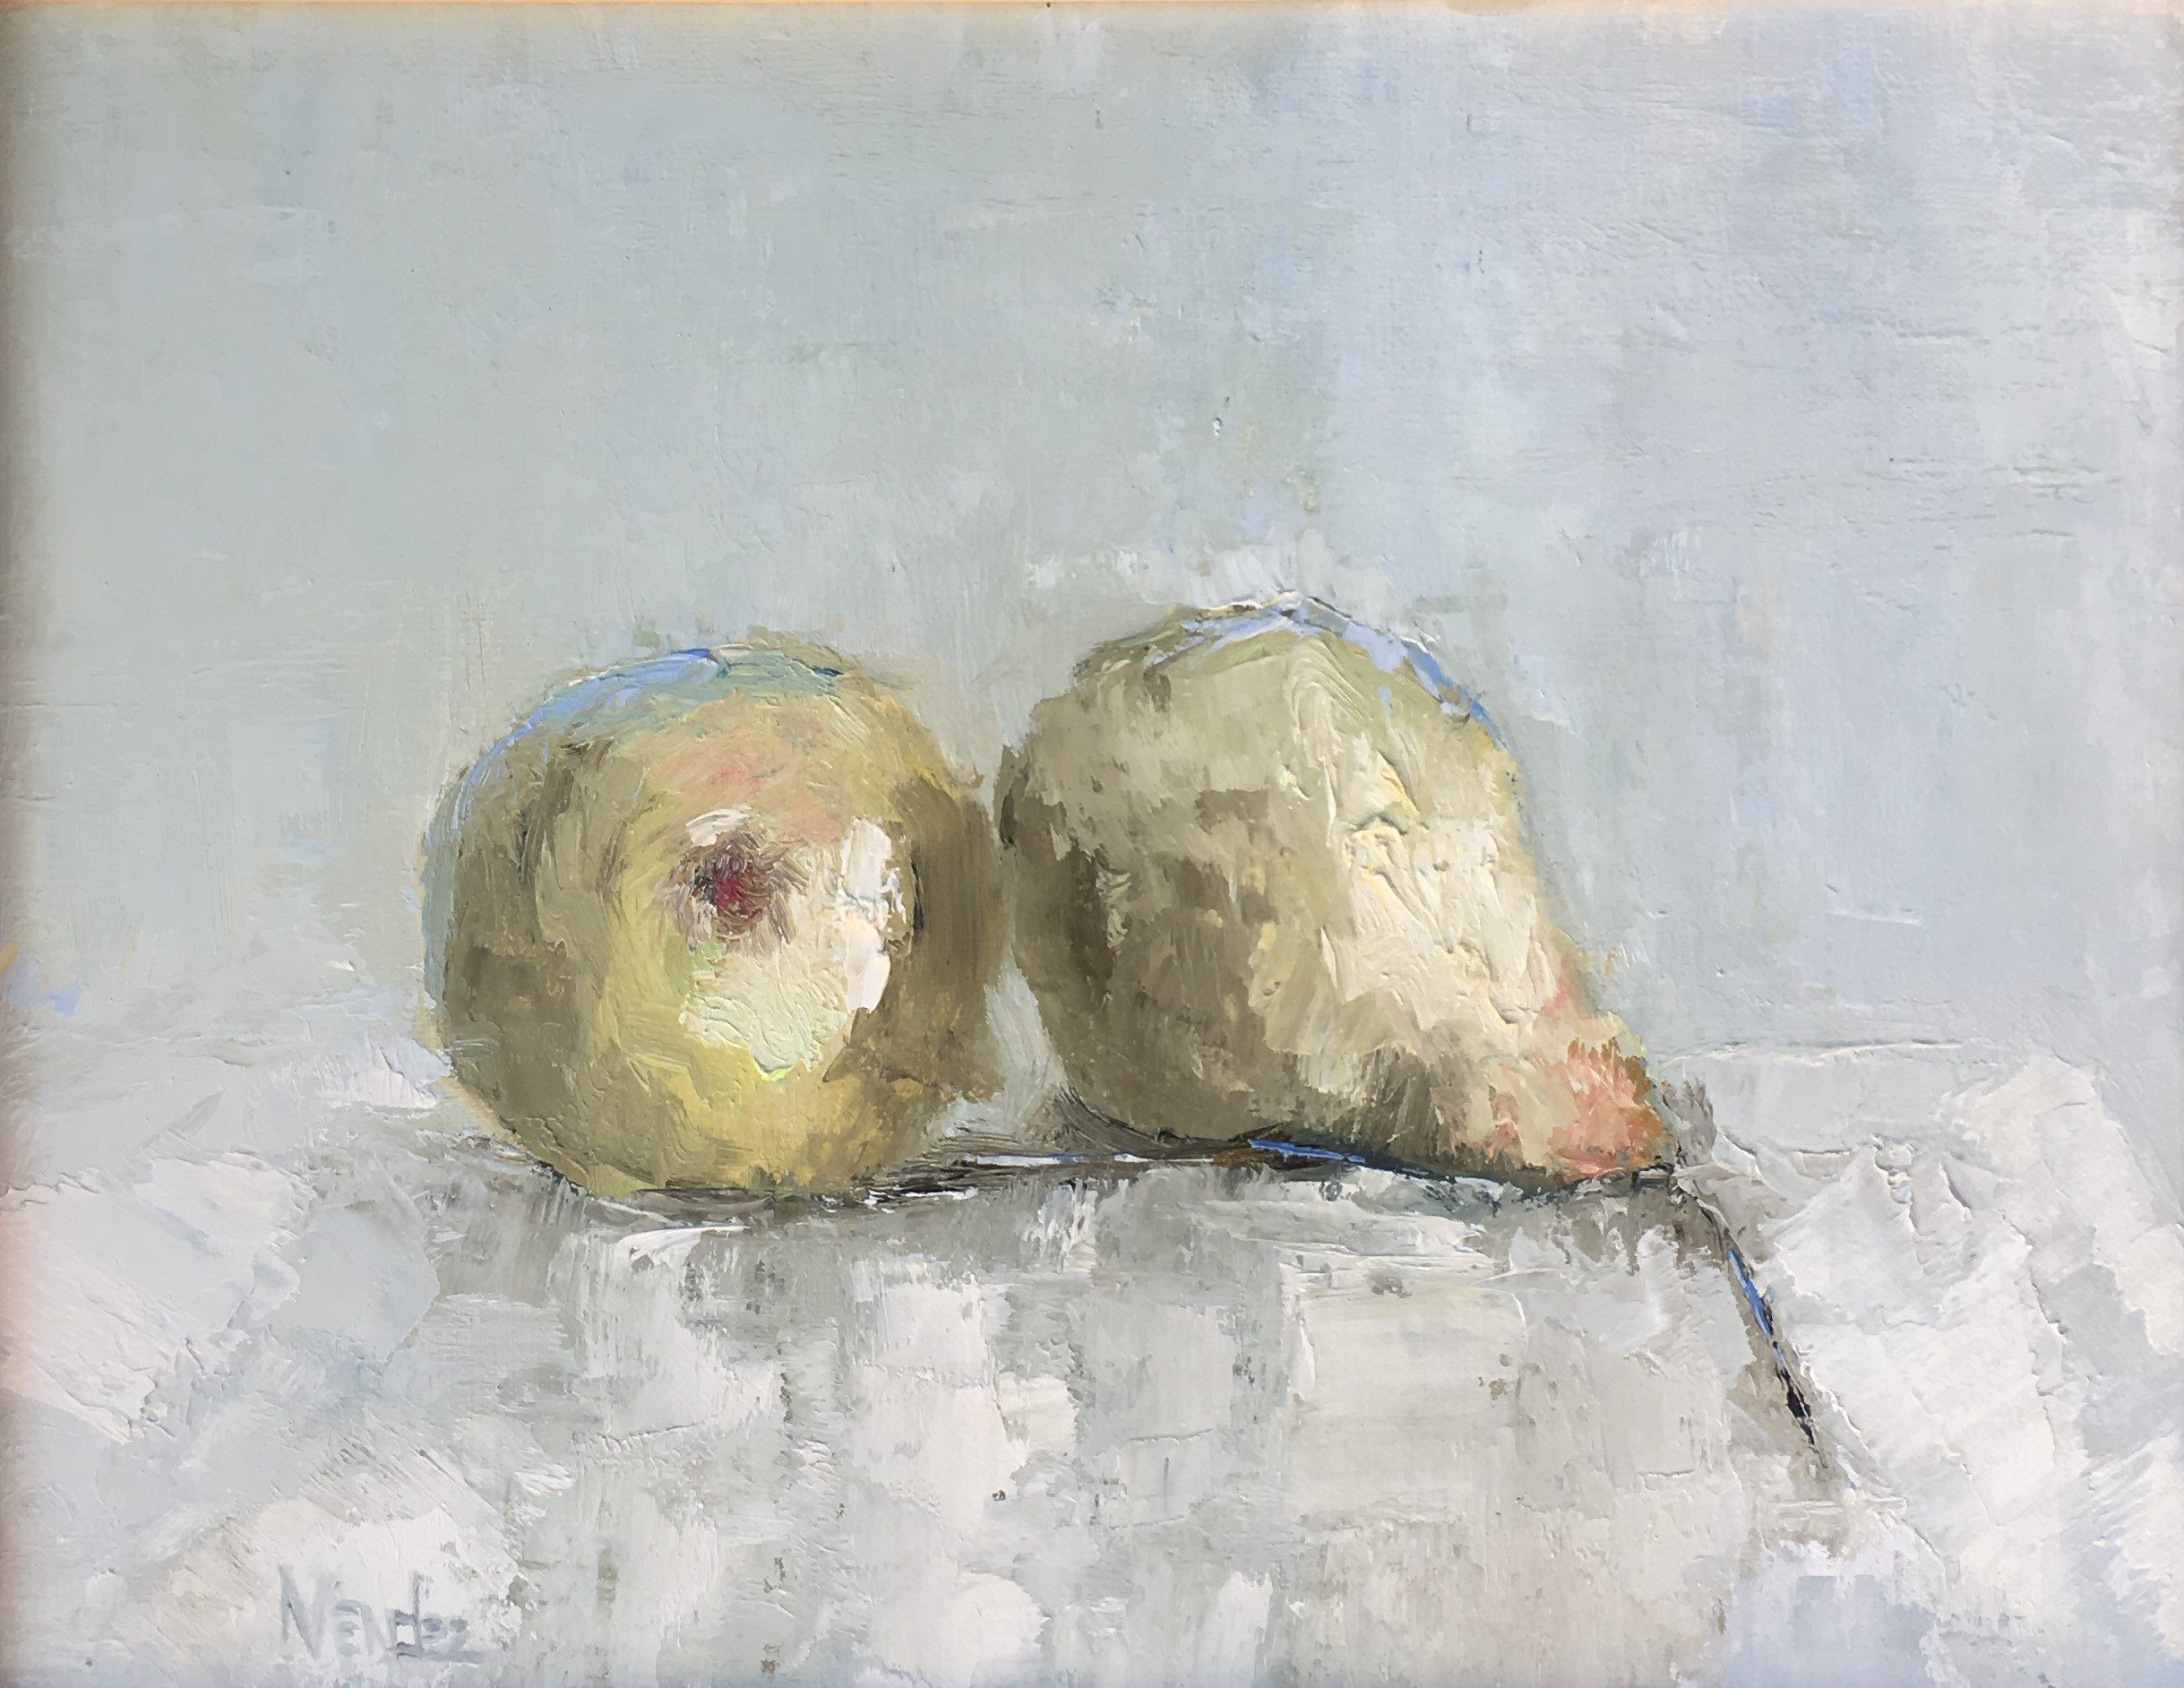 Fruit of the Spirit 11x14